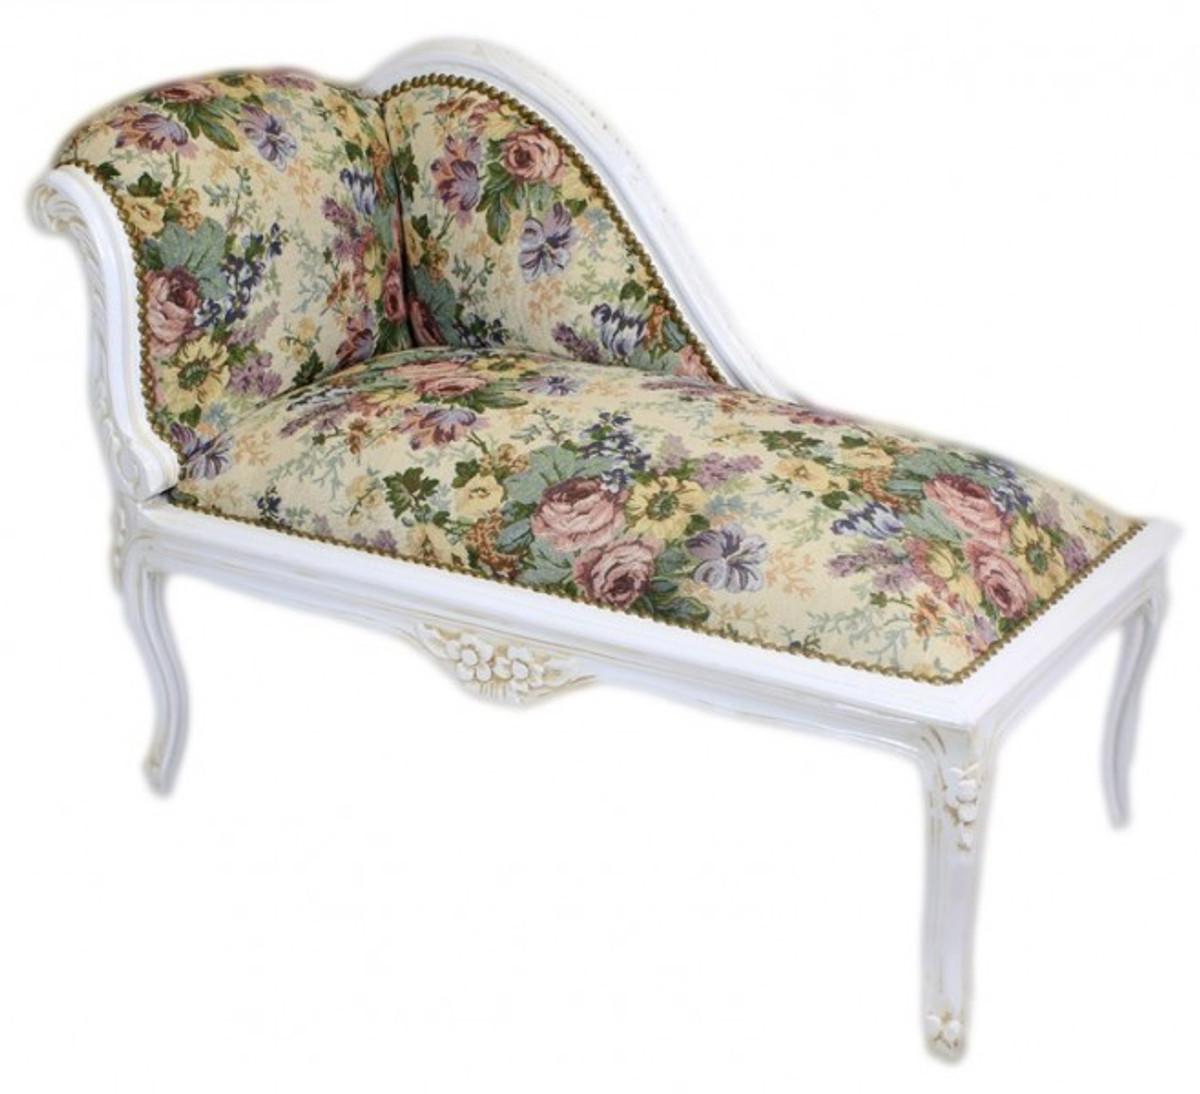 casa padrino barock kinder chaiselongue blumen muster antik weiss recamiere barock m bel. Black Bedroom Furniture Sets. Home Design Ideas